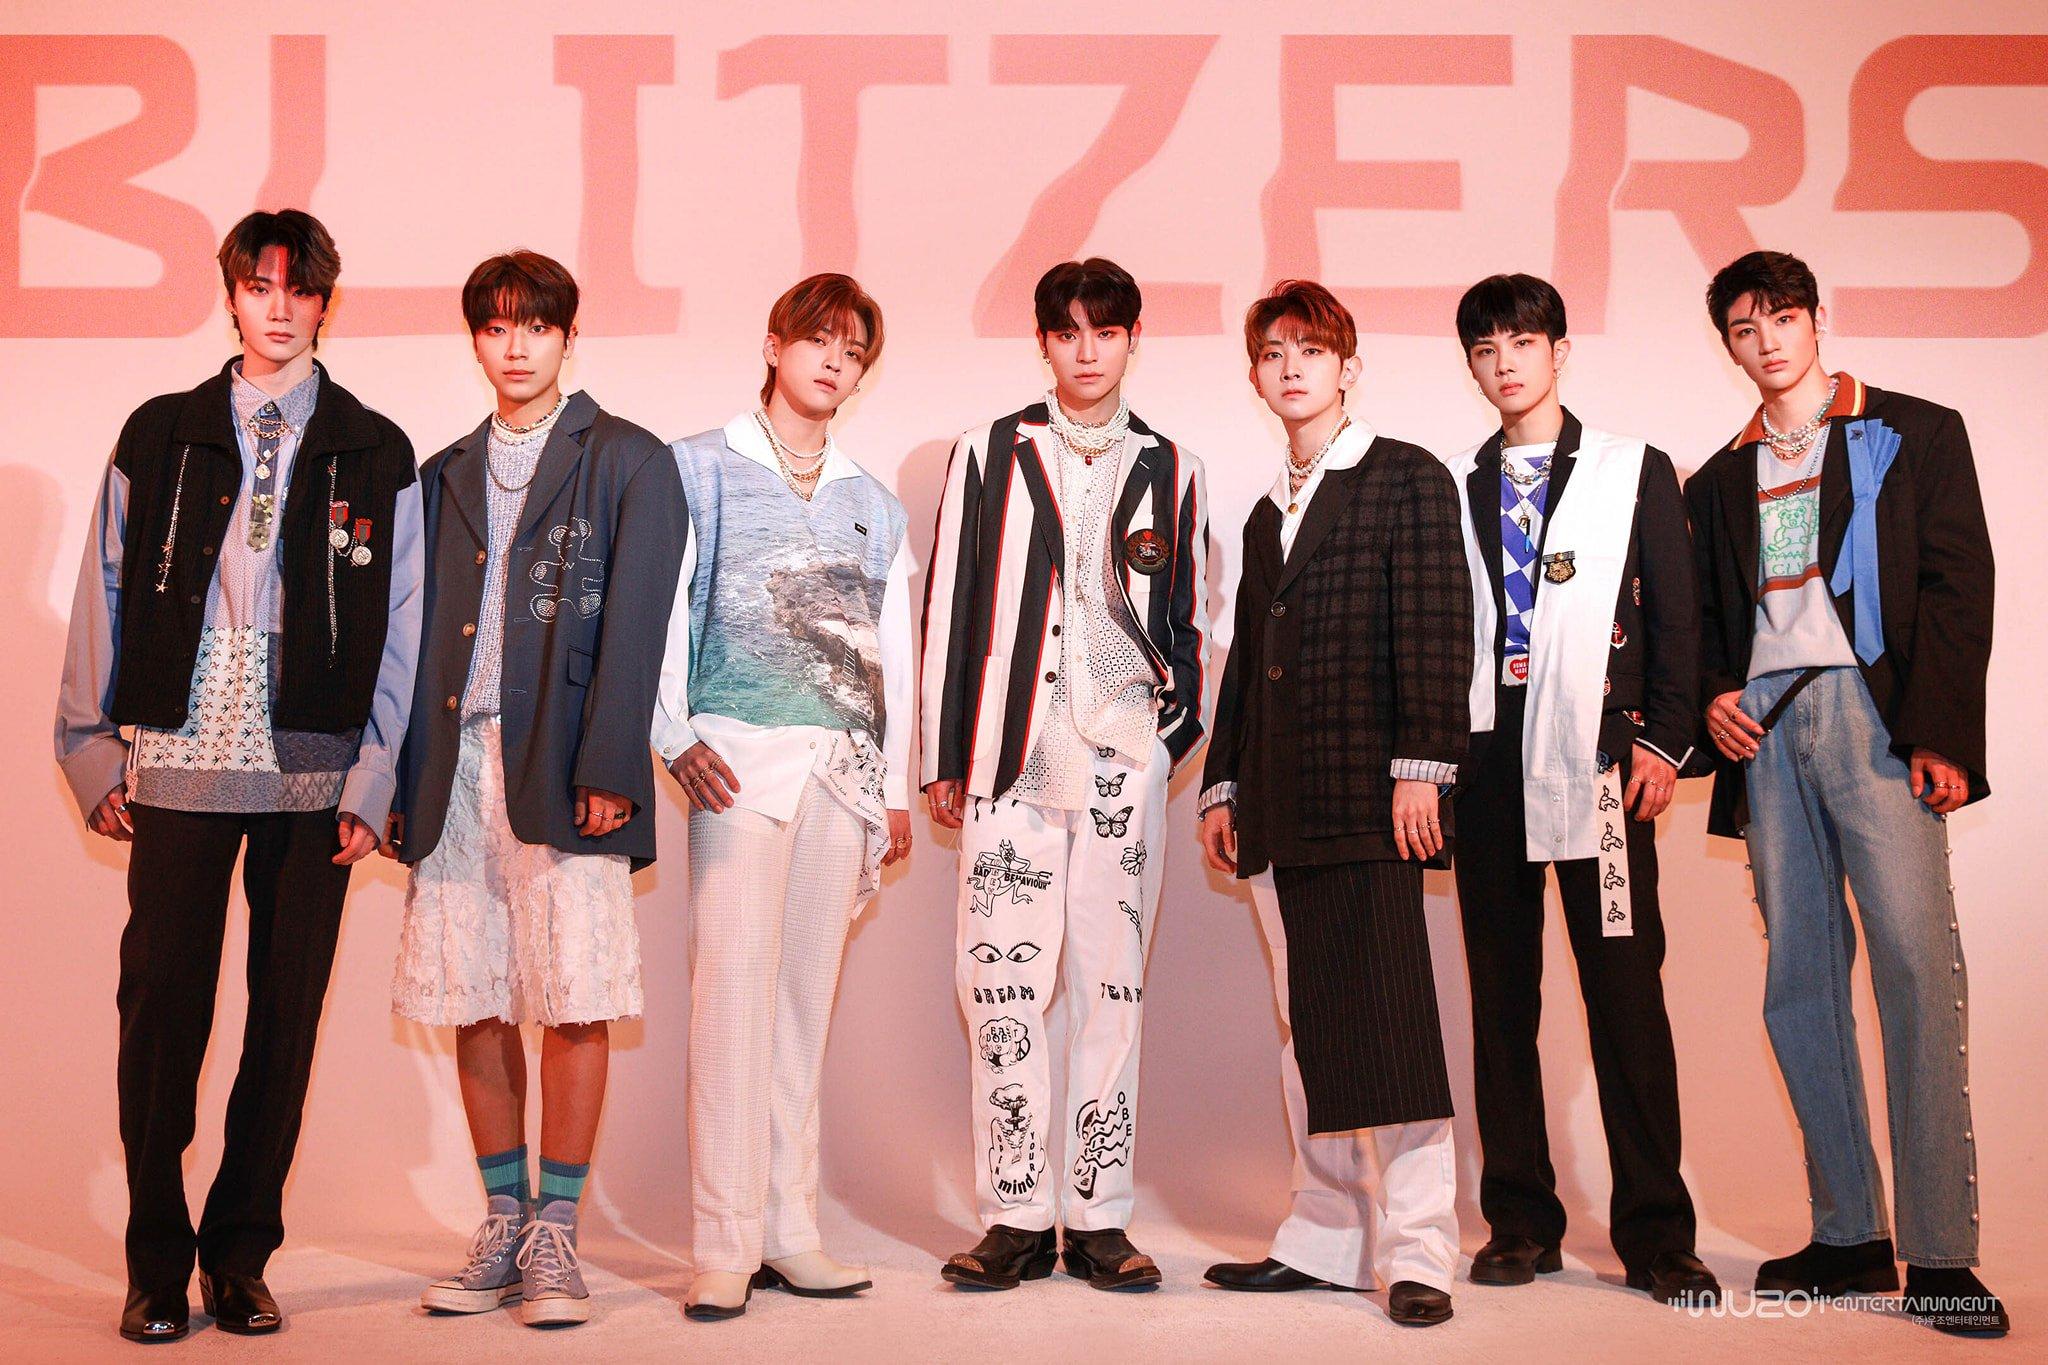 Upcoming boy group BLITZERS reveals debut mini-album cover image | allkpop